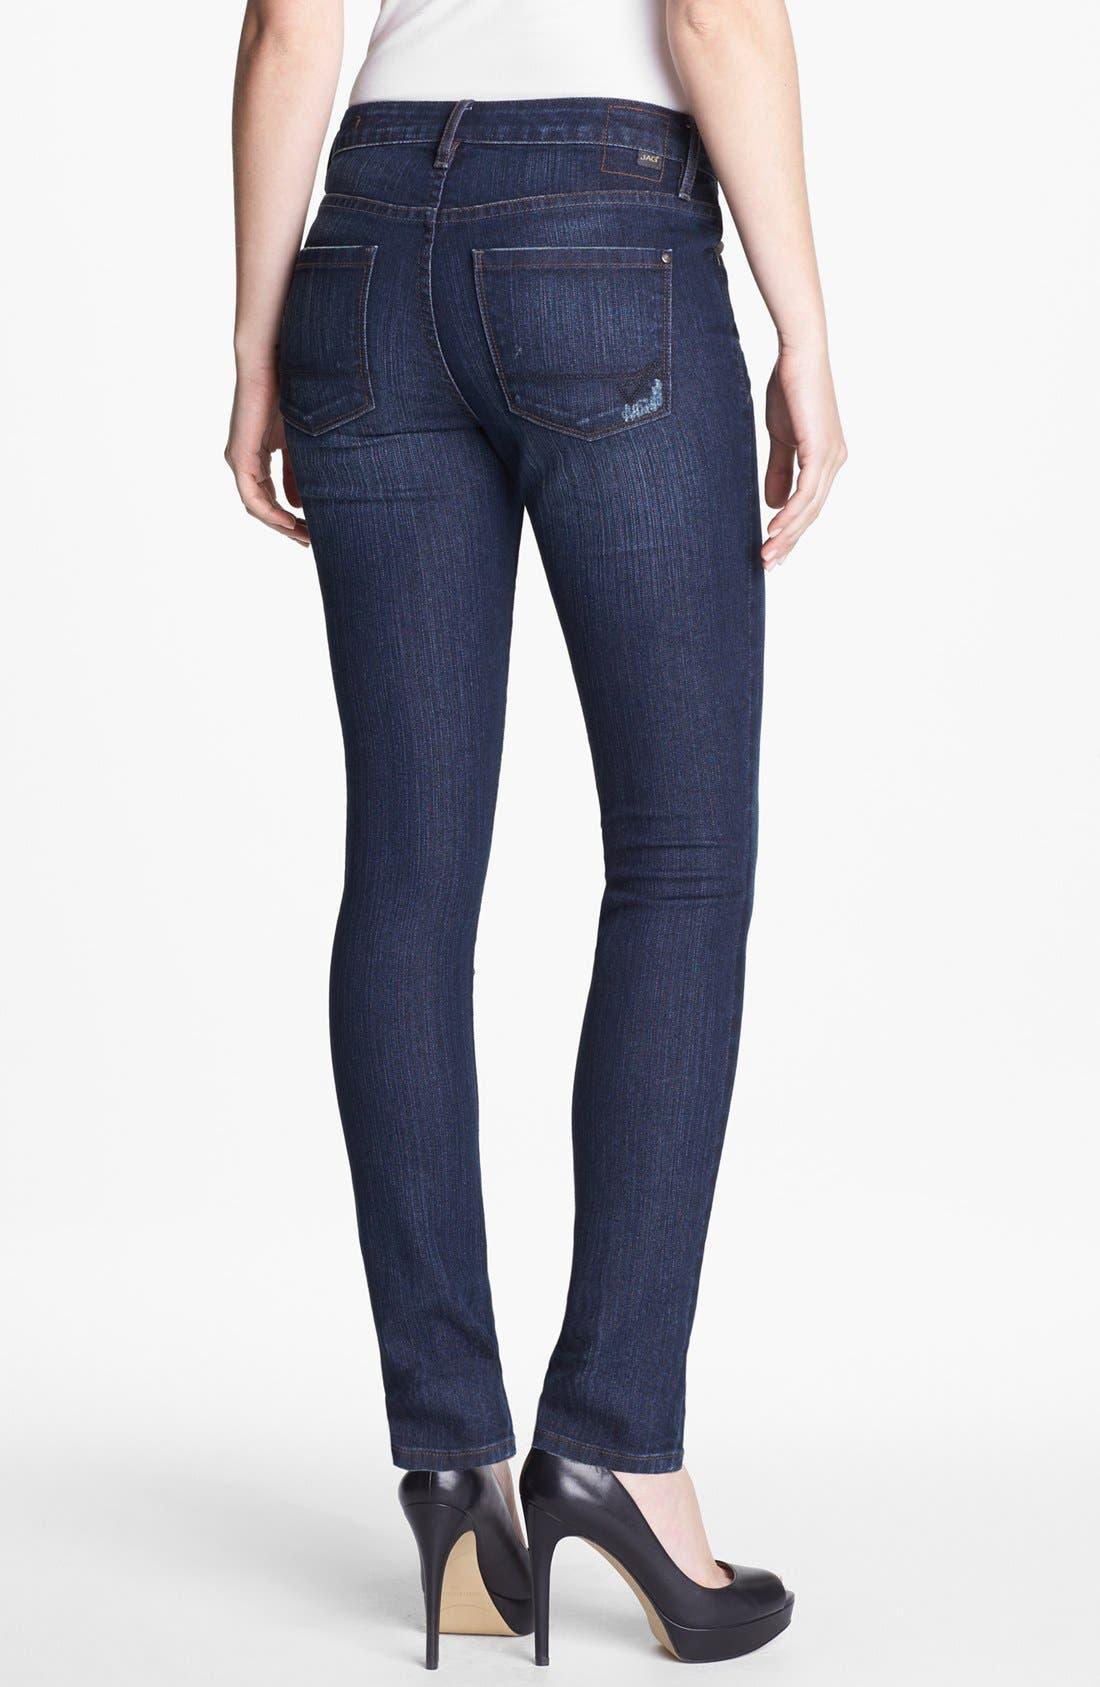 Alternate Image 2  - Jag Jeans 'Reece' Skinny Stretch Jeans (Online Only)